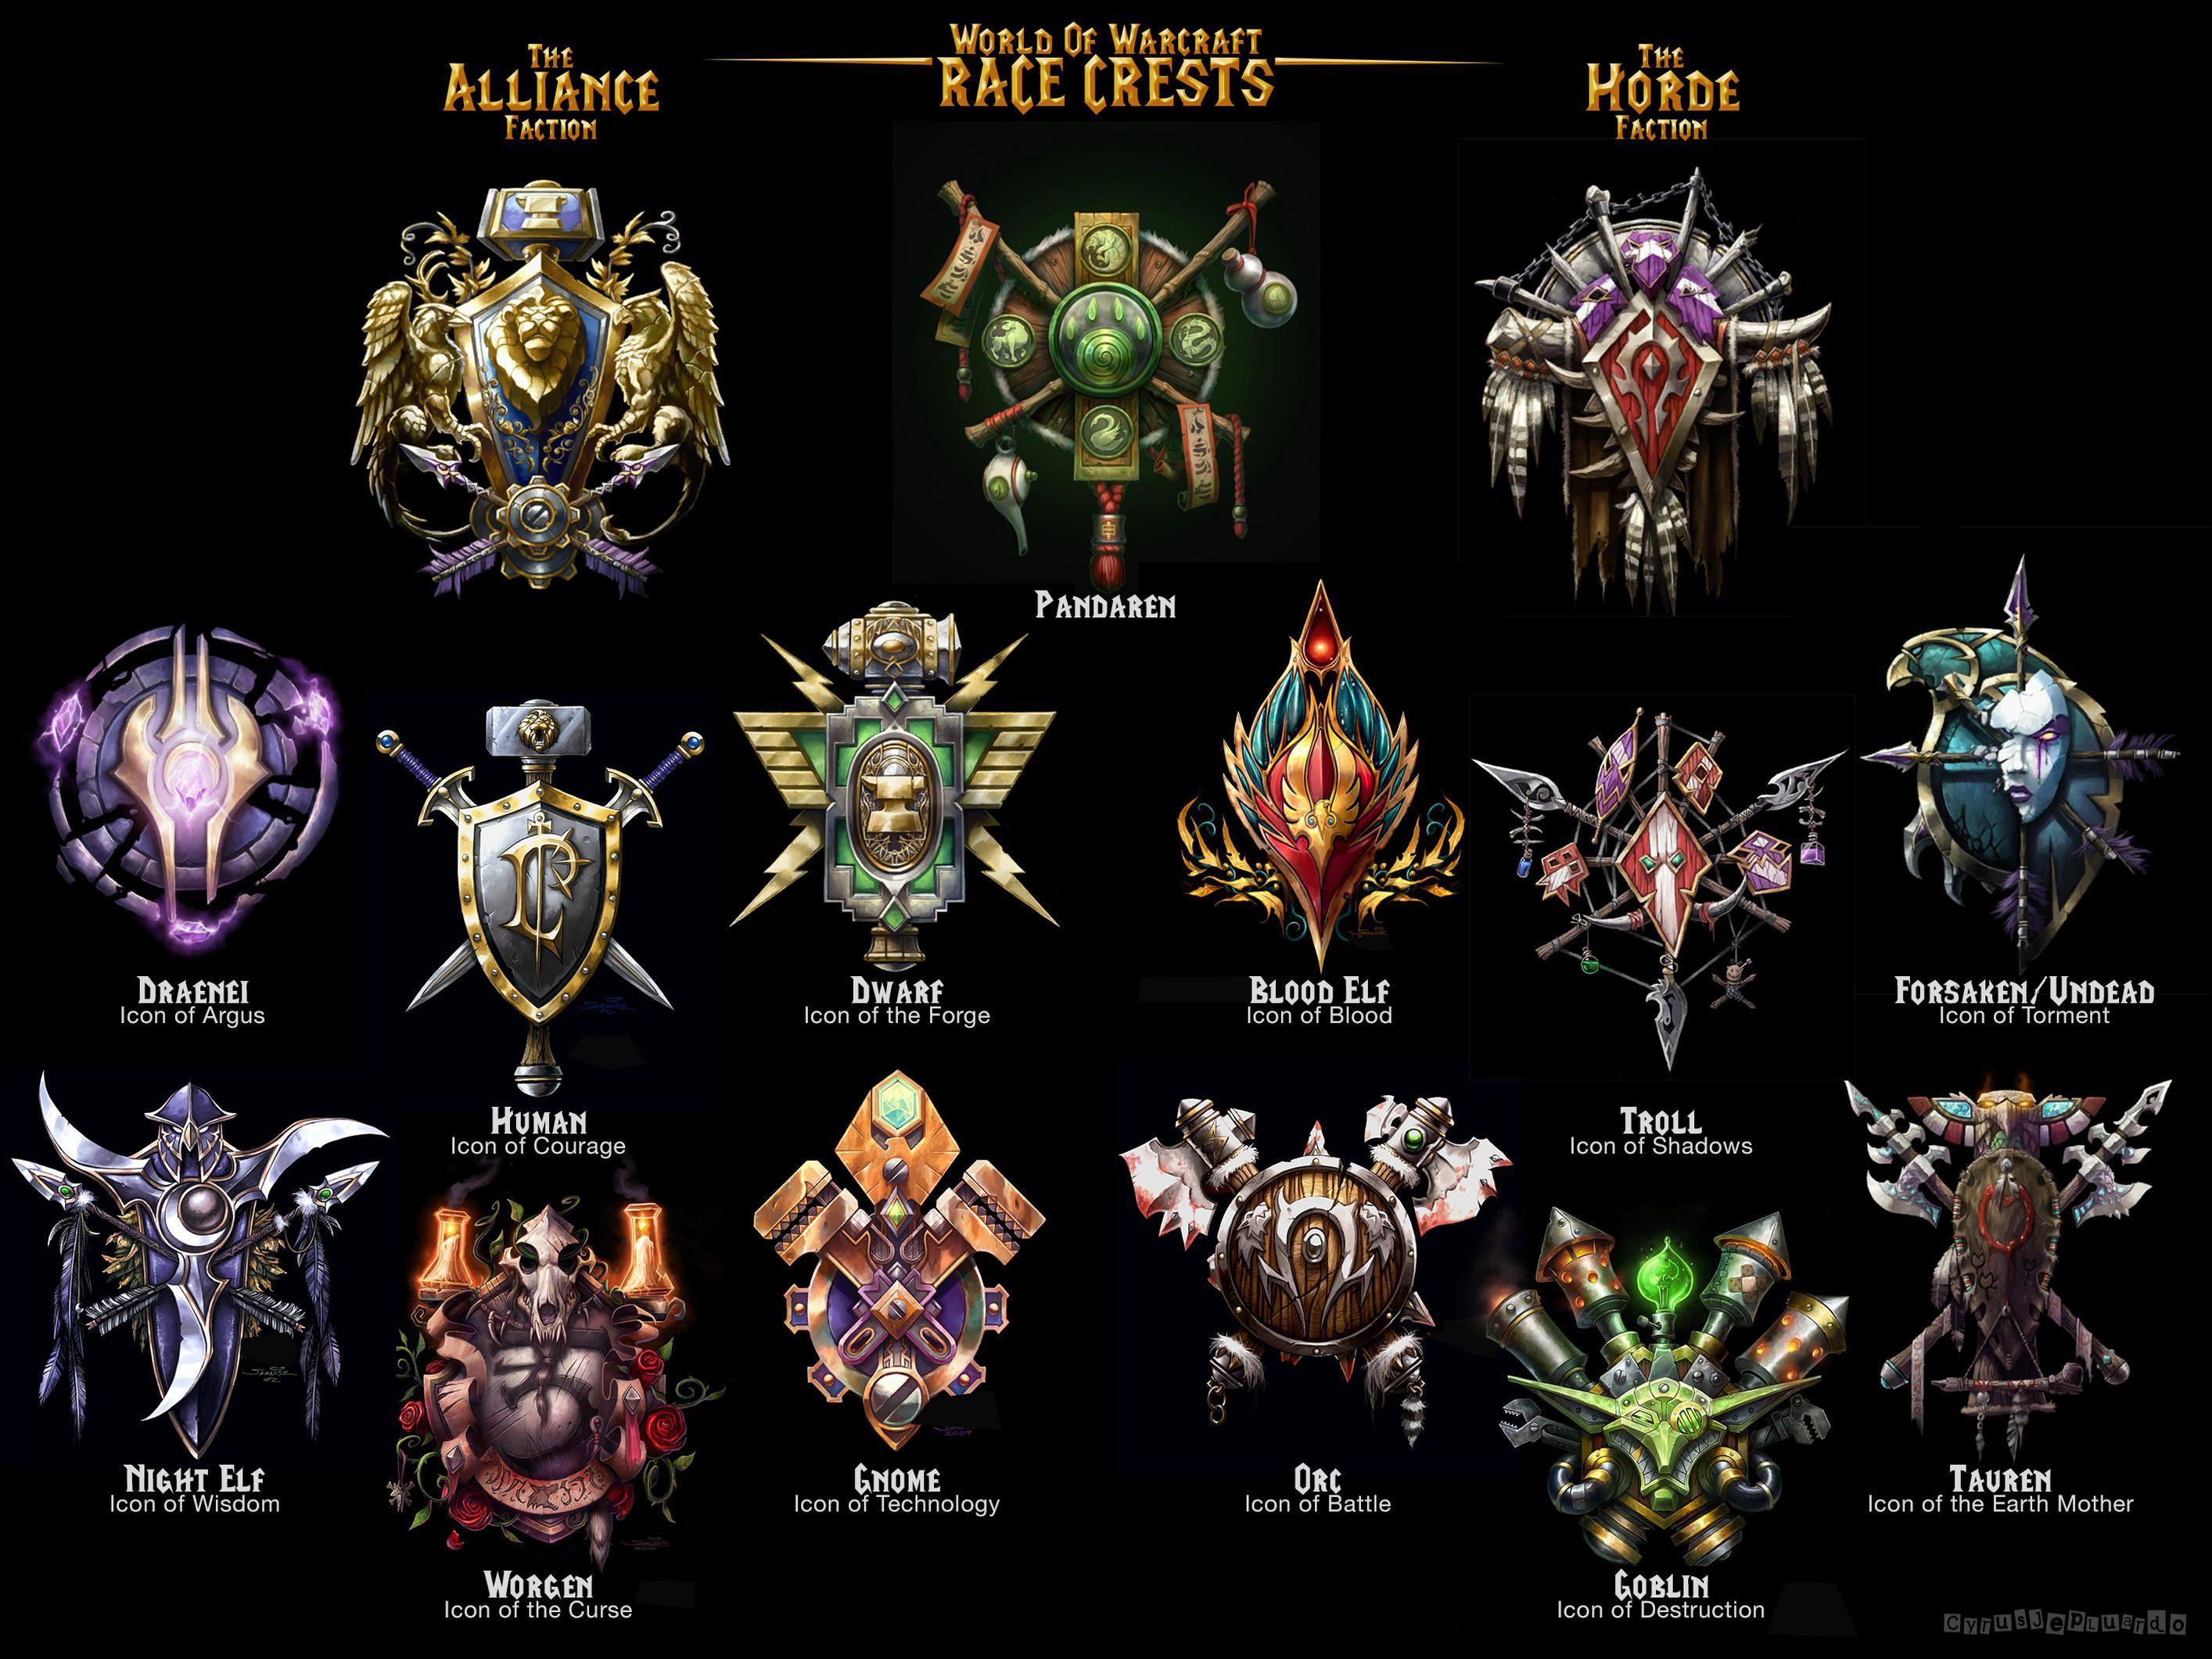 Warcraft Race Crests World Of Warcraft Wallpaper World Of